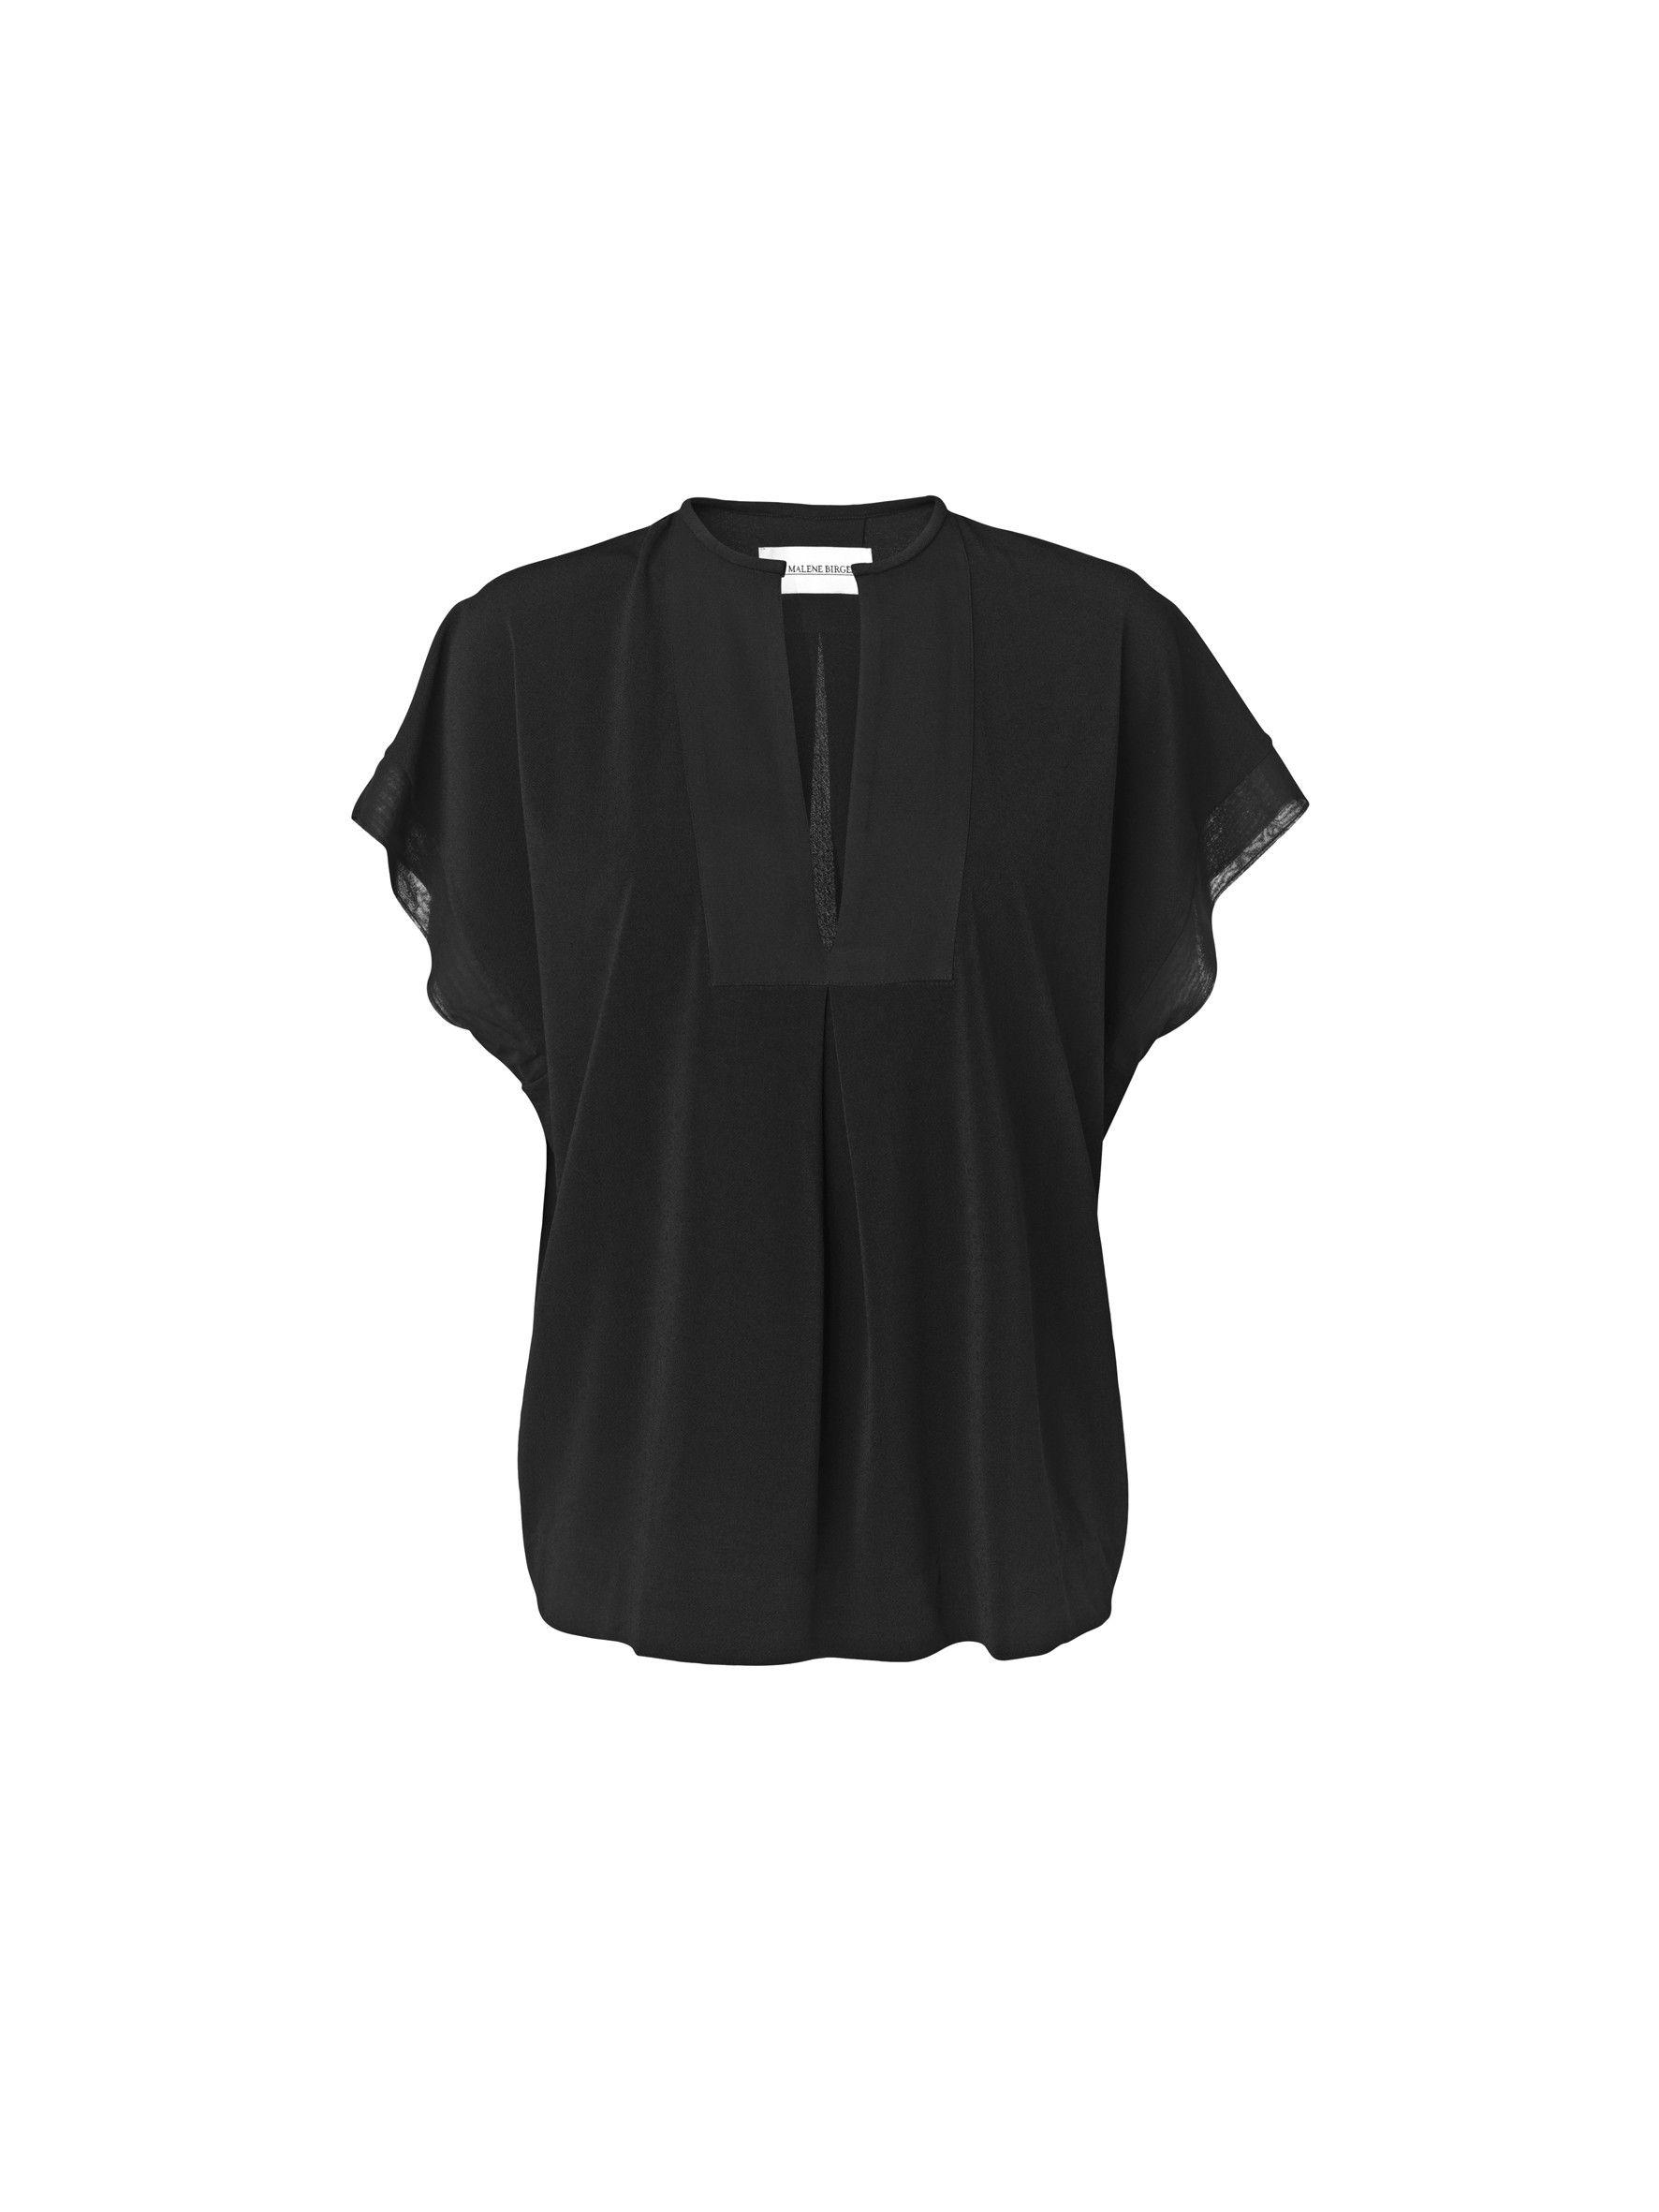 c301841a BY MALENE BIRGER SS16 | My Style | Tops, Malene birger, Fashion